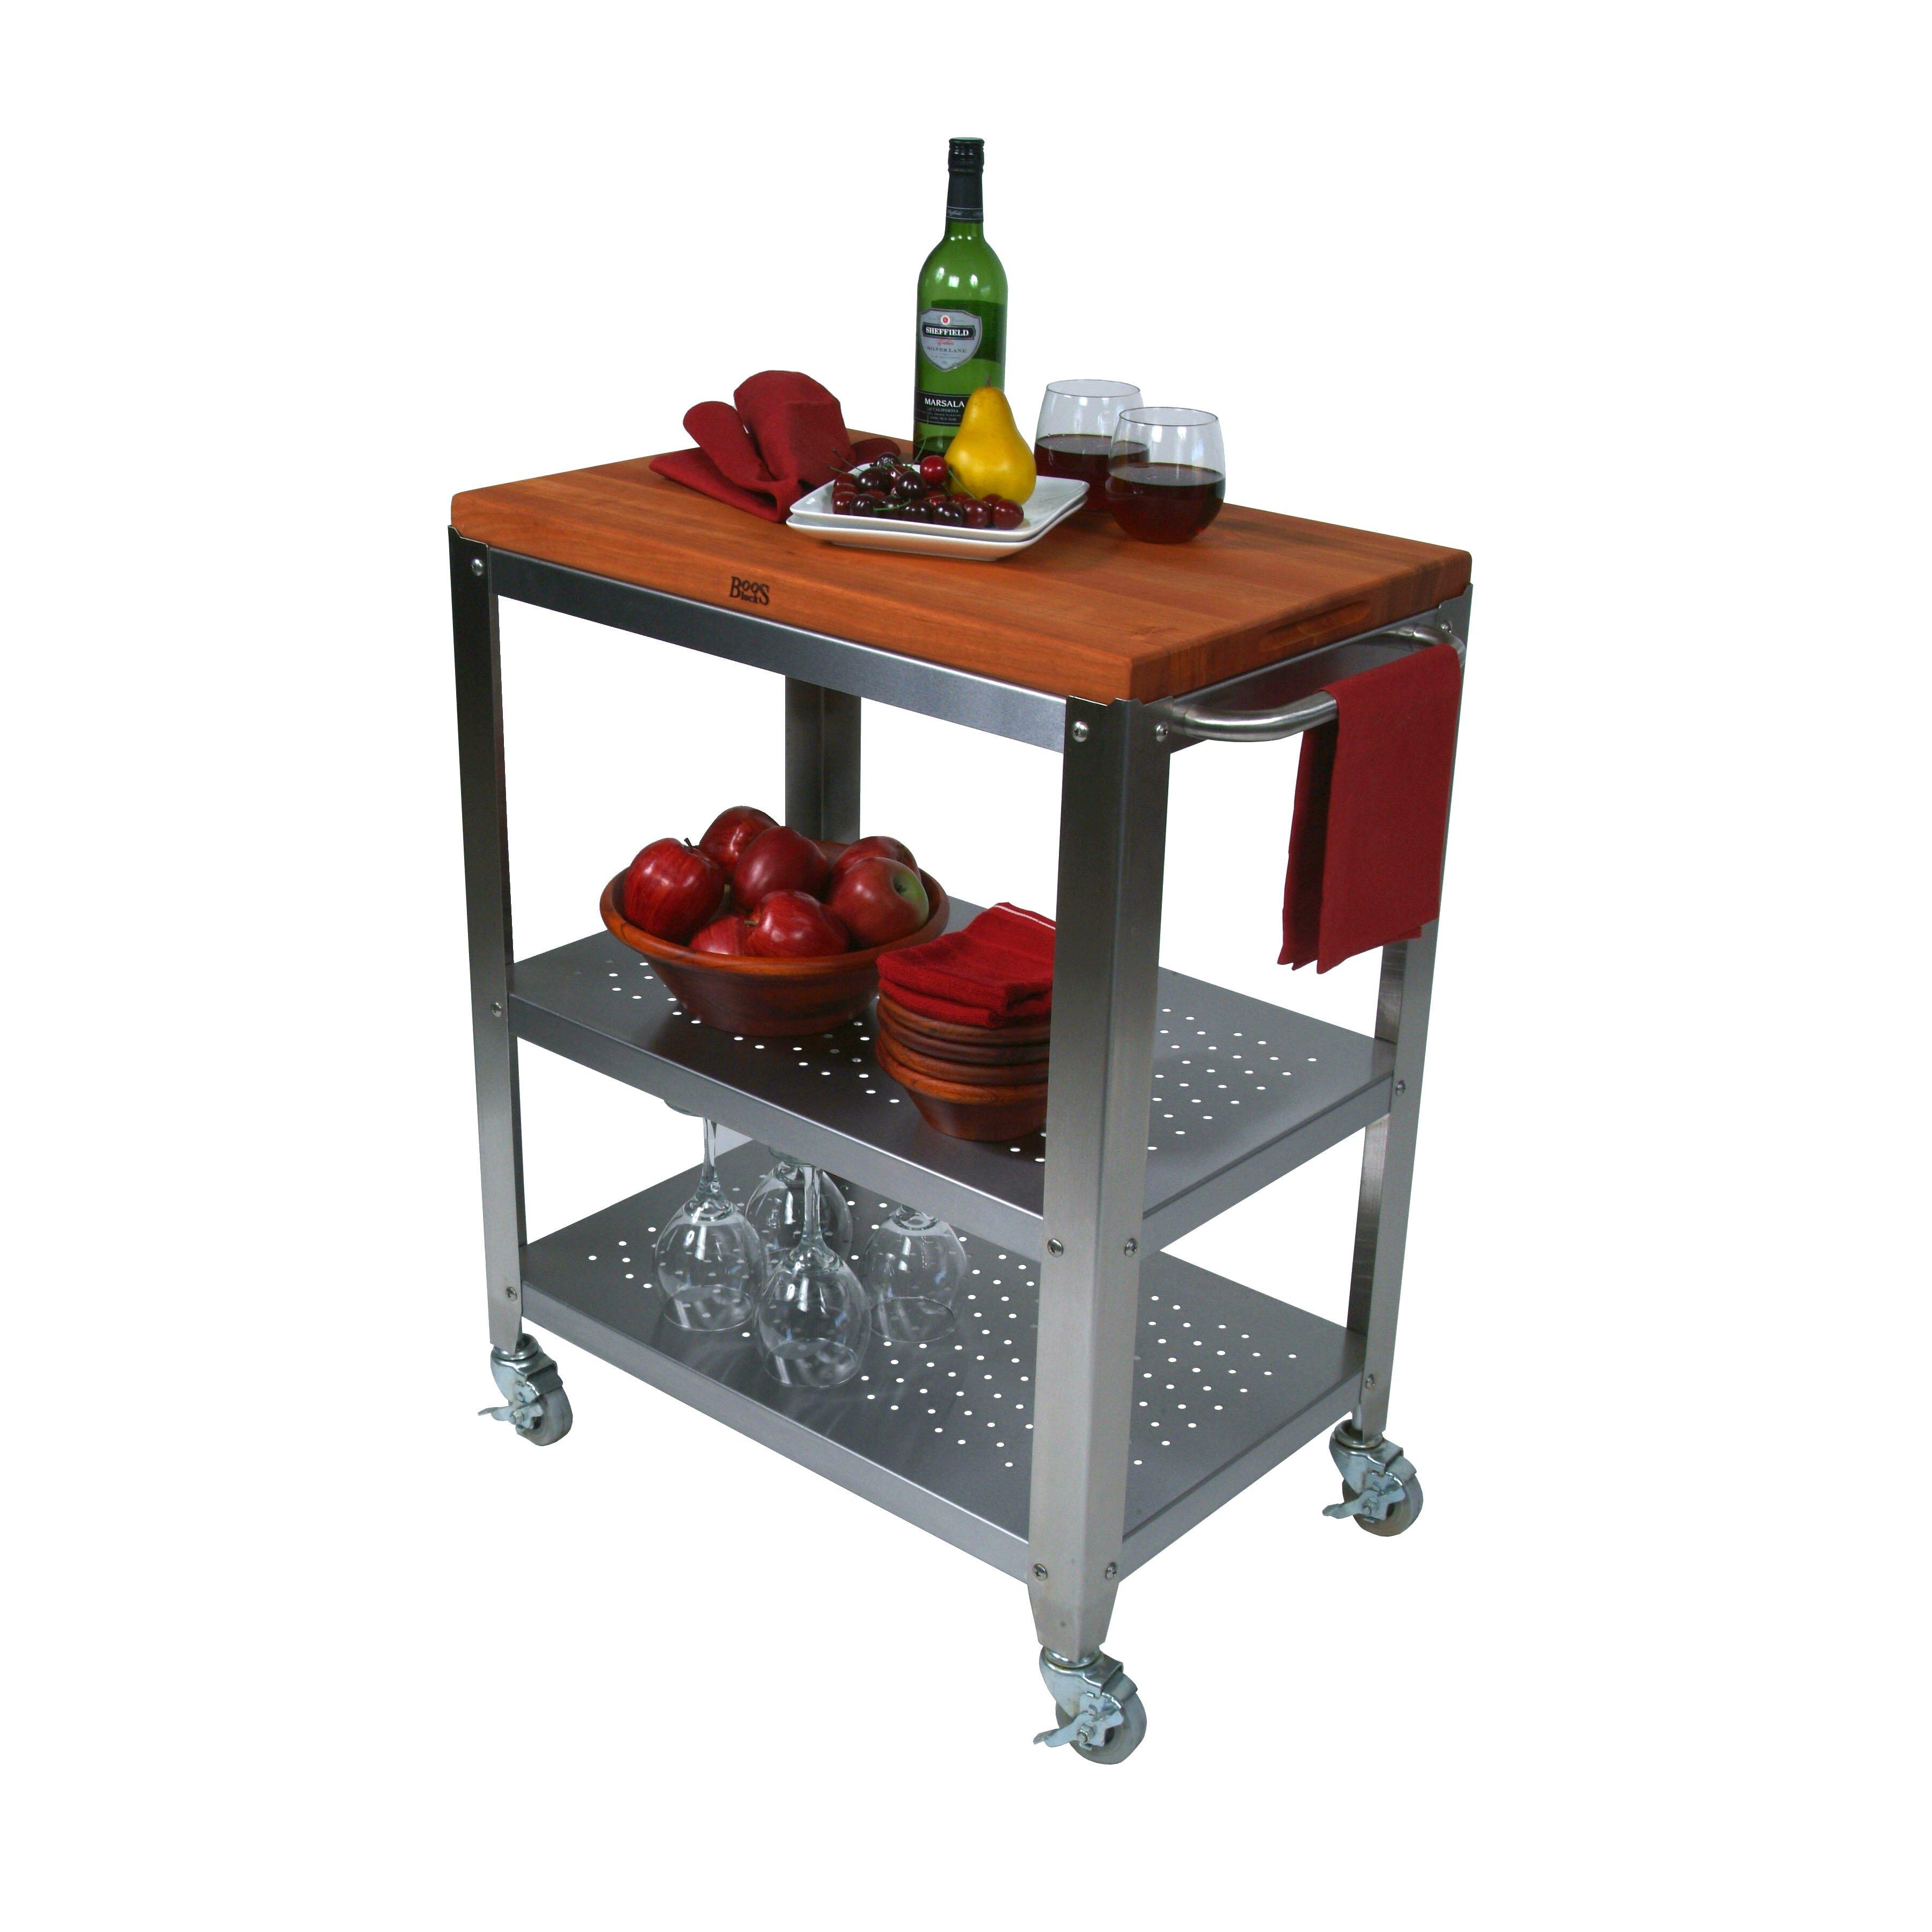 Cucina americana culinarte kitchen cart with wood top wayfair - Cucina americana ...